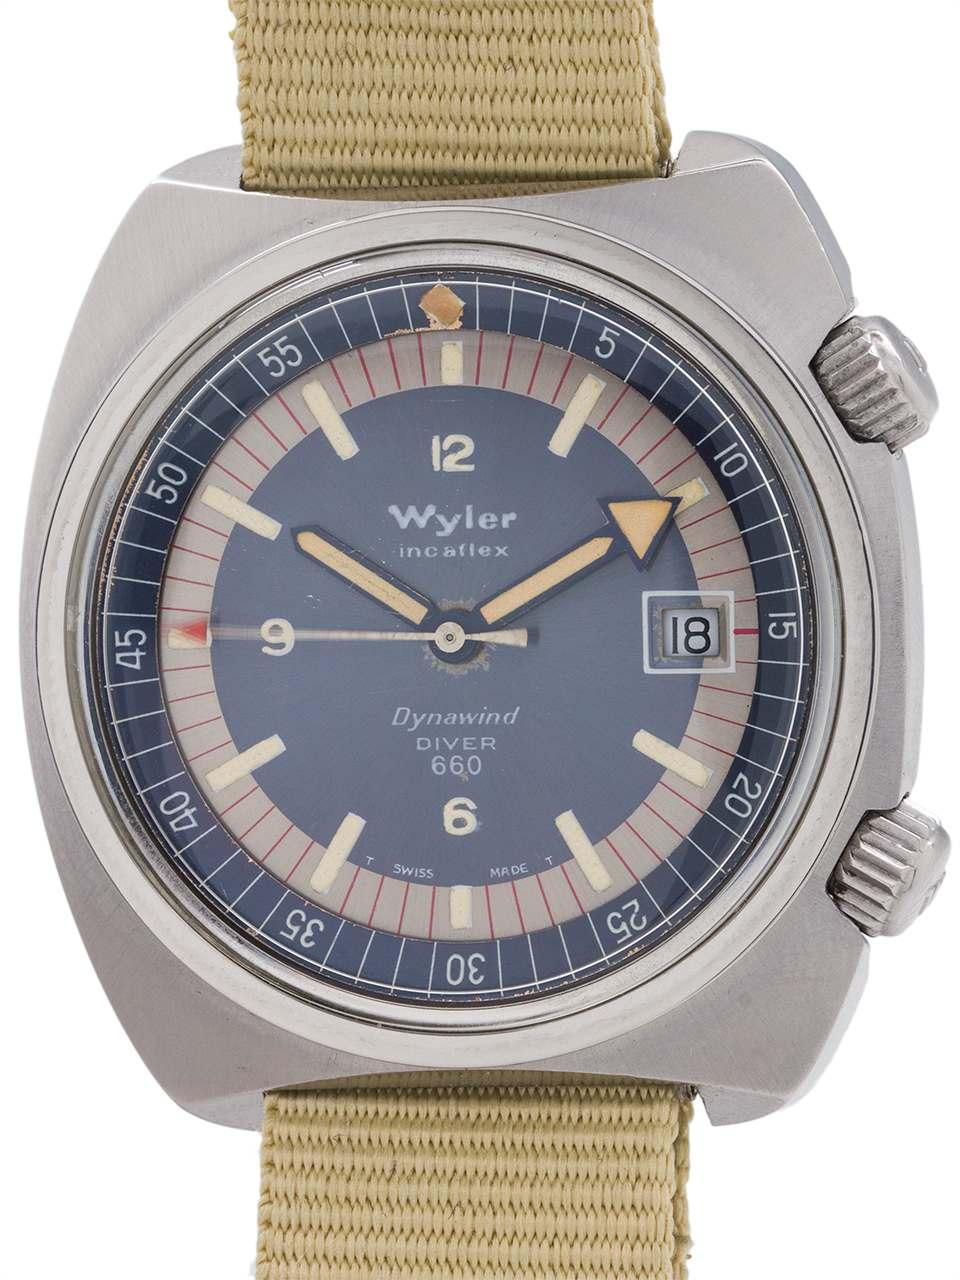 "Wyler Diver 660 ""Dynawind"" circa 1960's"